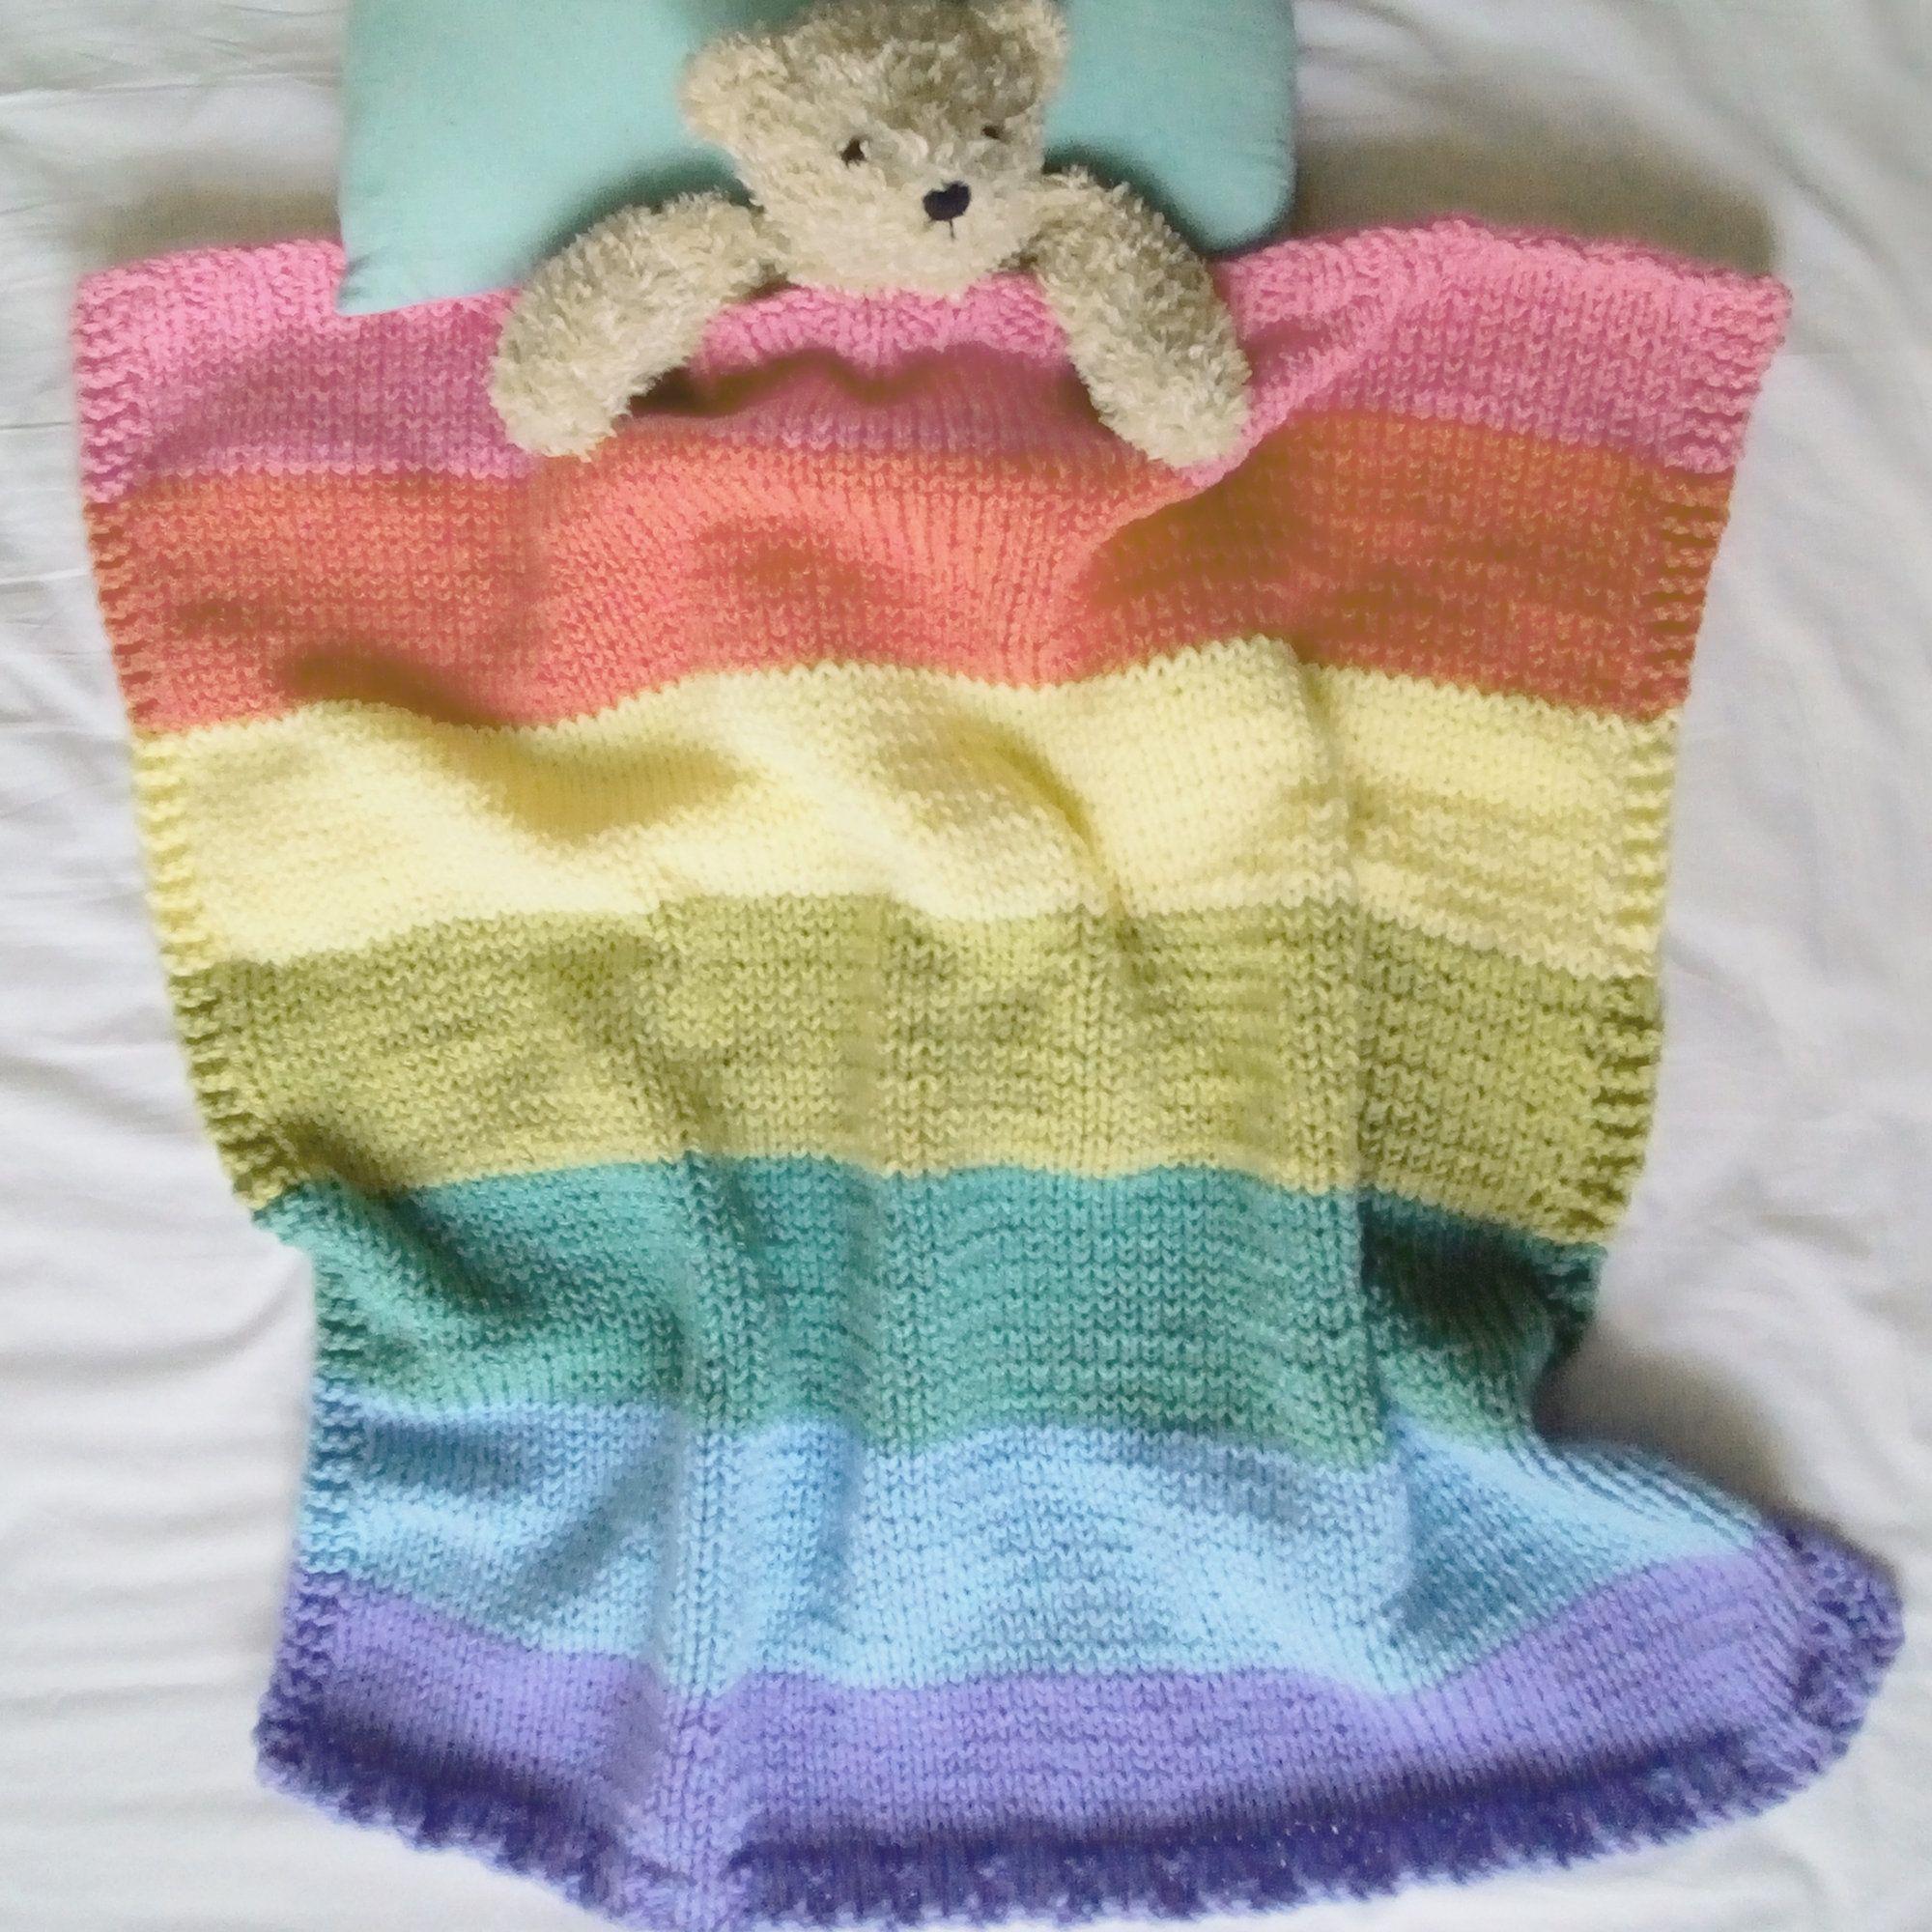 BABY BLANKET PATTERN: Easy knit rainbow baby blanket ...